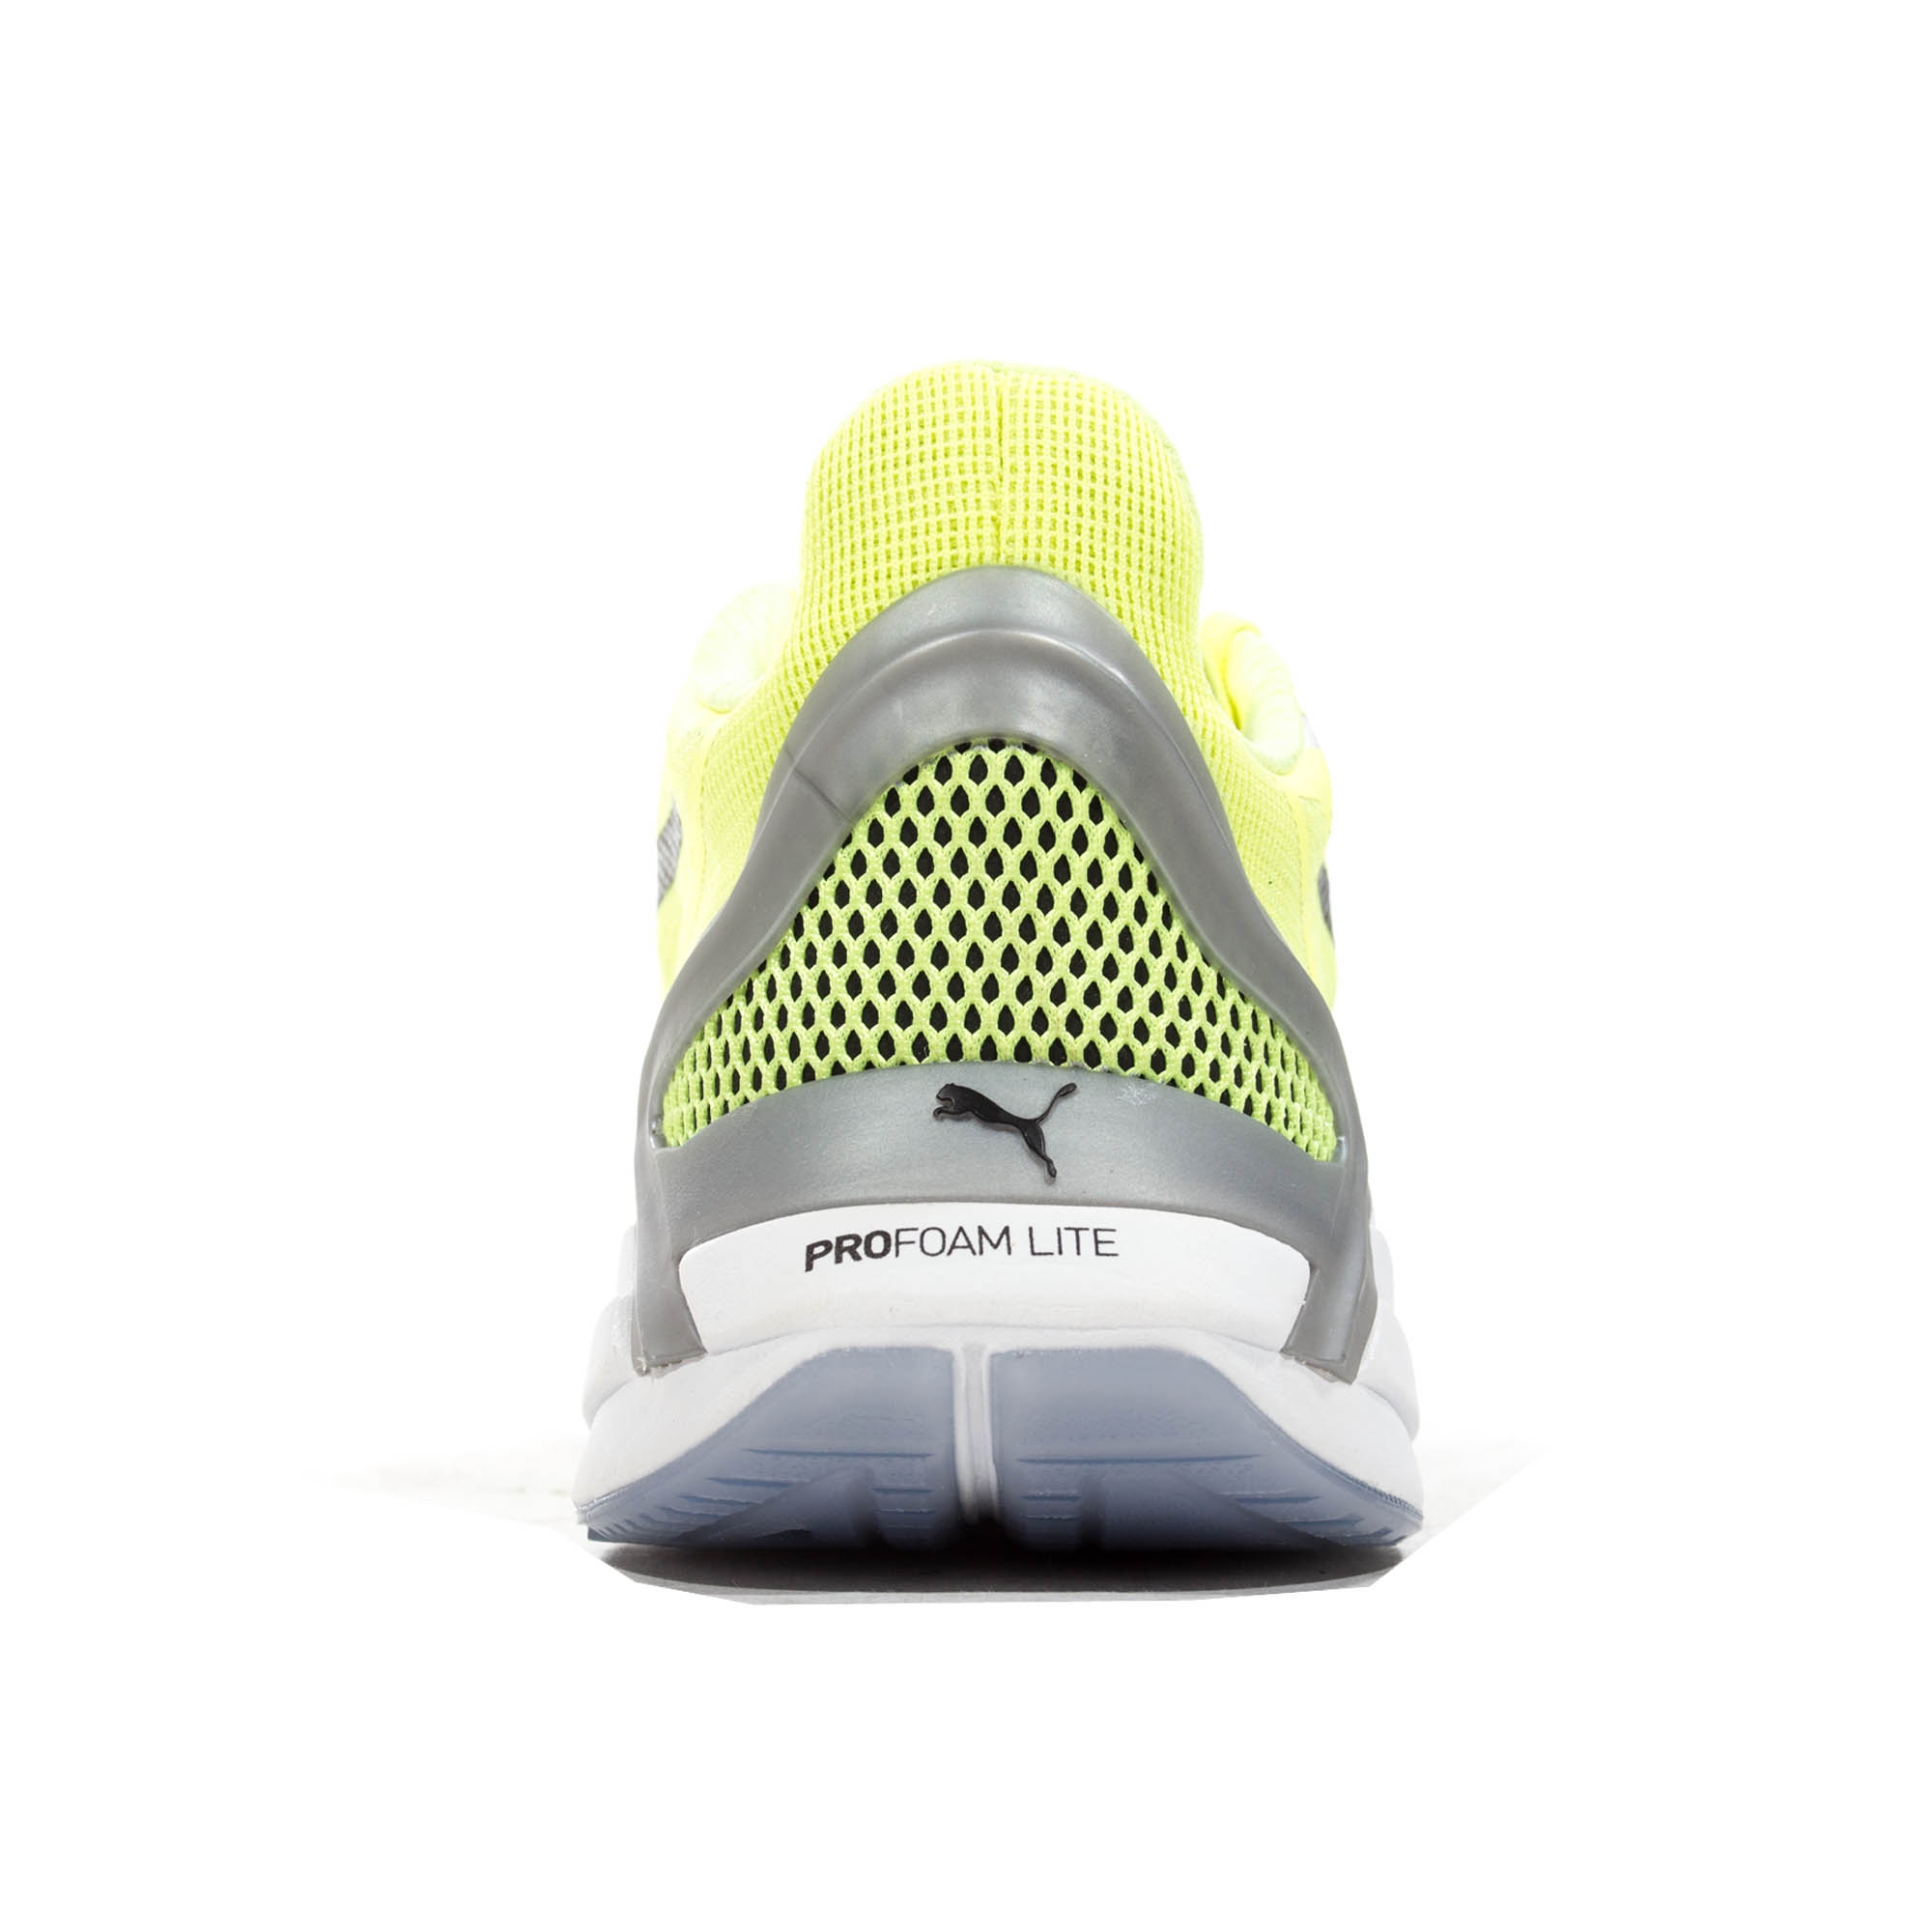 miniature 10 - Puma ultraride FM XTREME Homme Running Fitness Training Trainer Chaussure Jaune